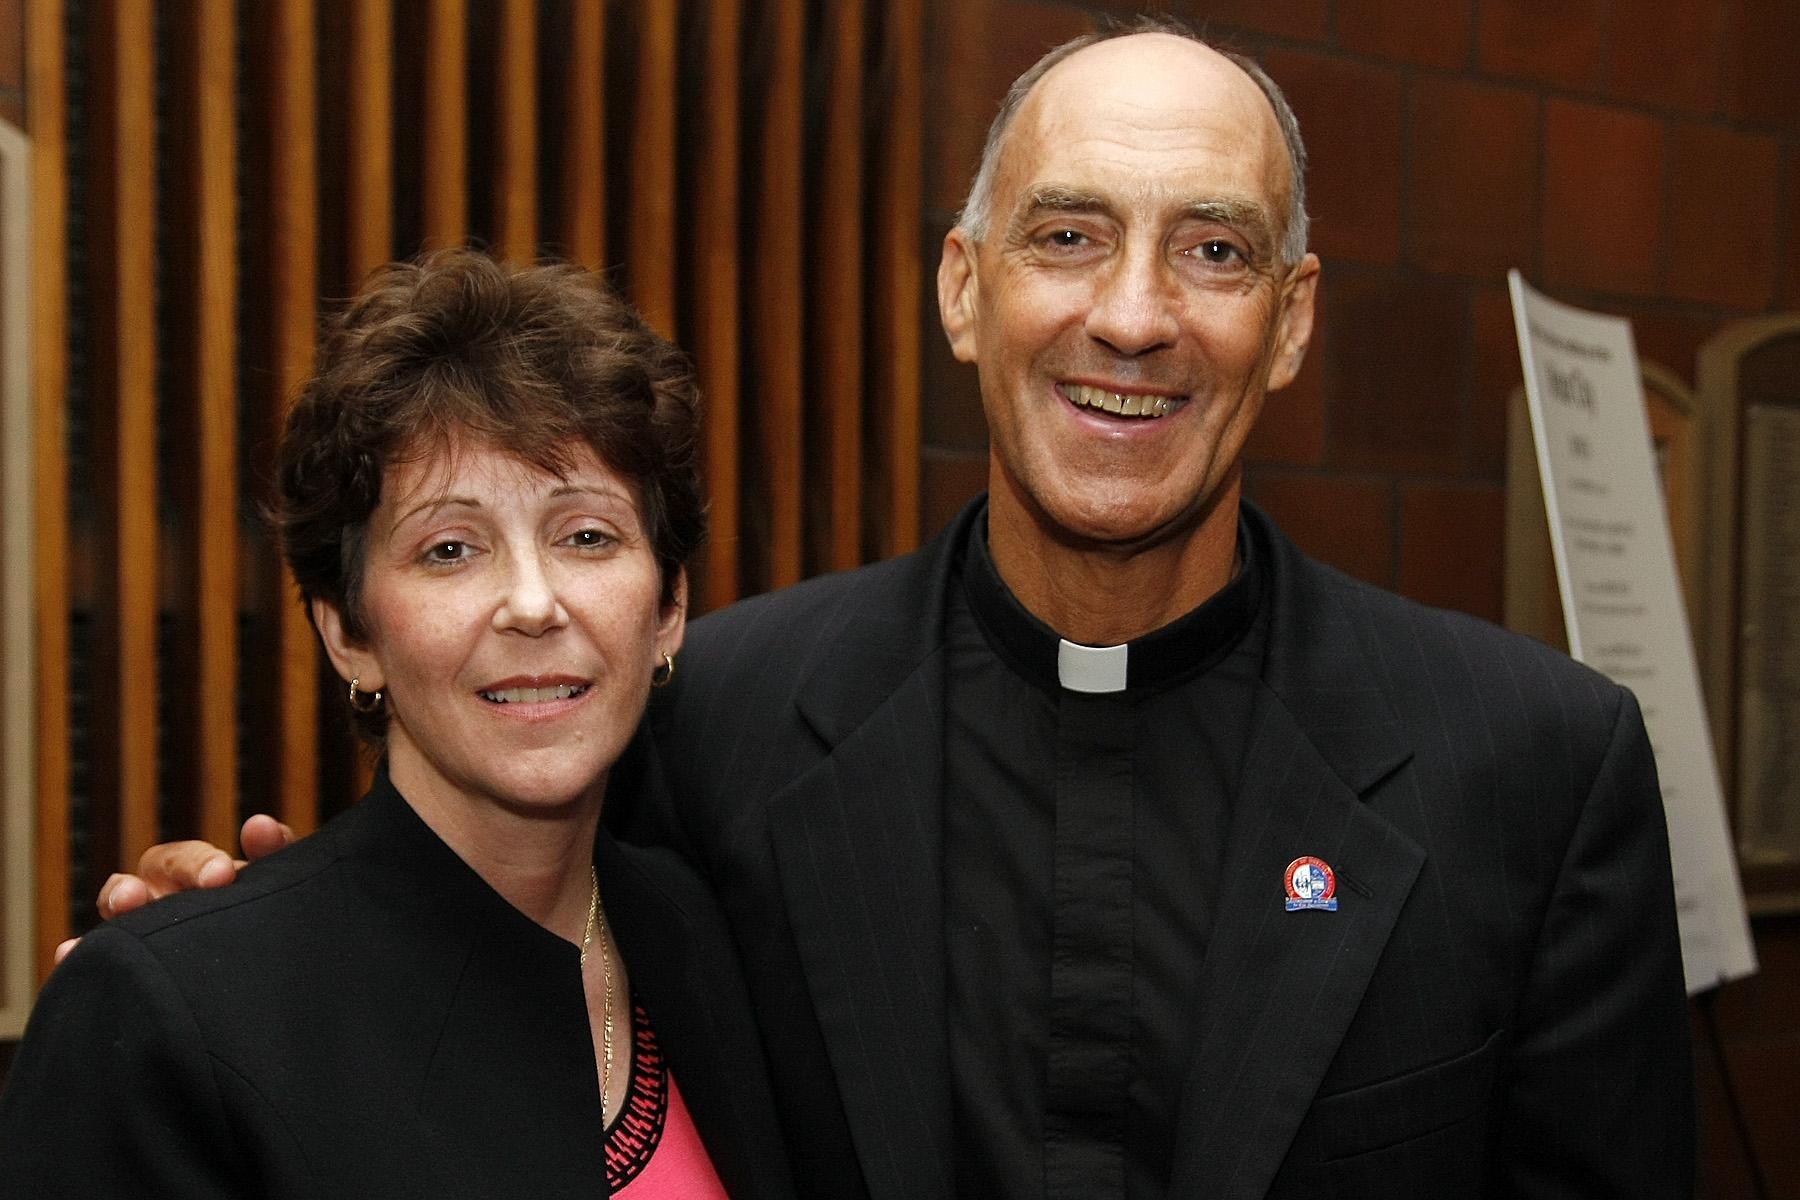 Liver transplant recipient with priest